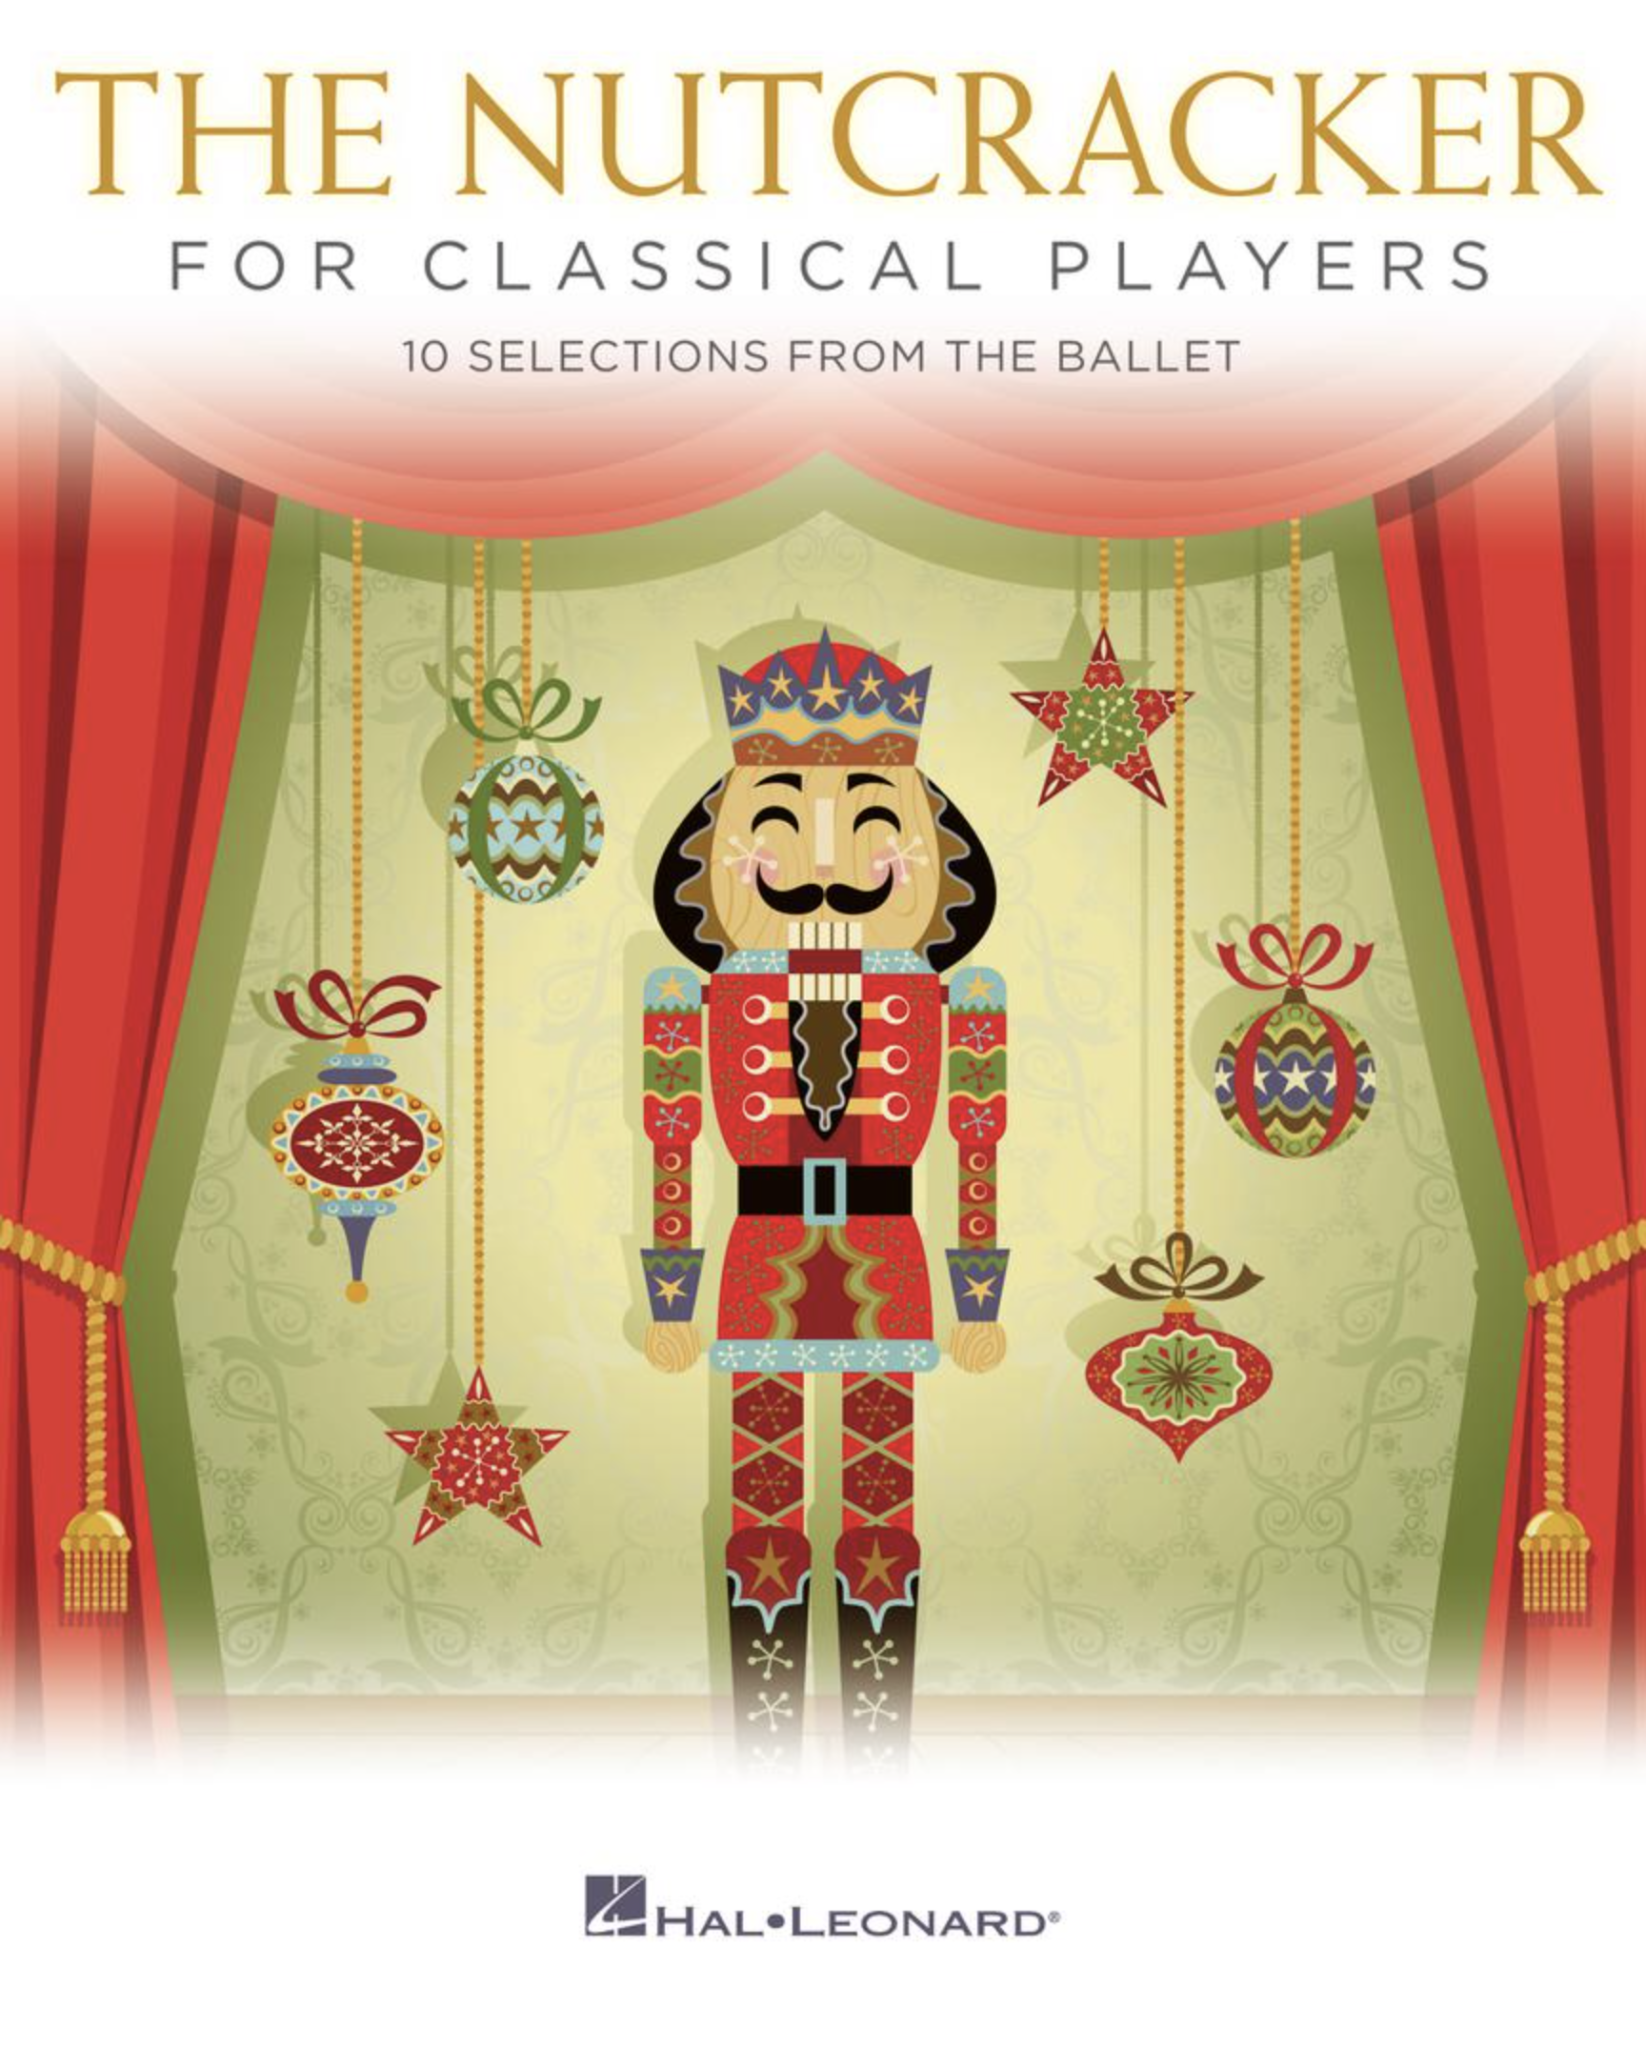 HAL LEONARD Tchaikovsky: The Nutcracker (violin and piano) Hal Leonard